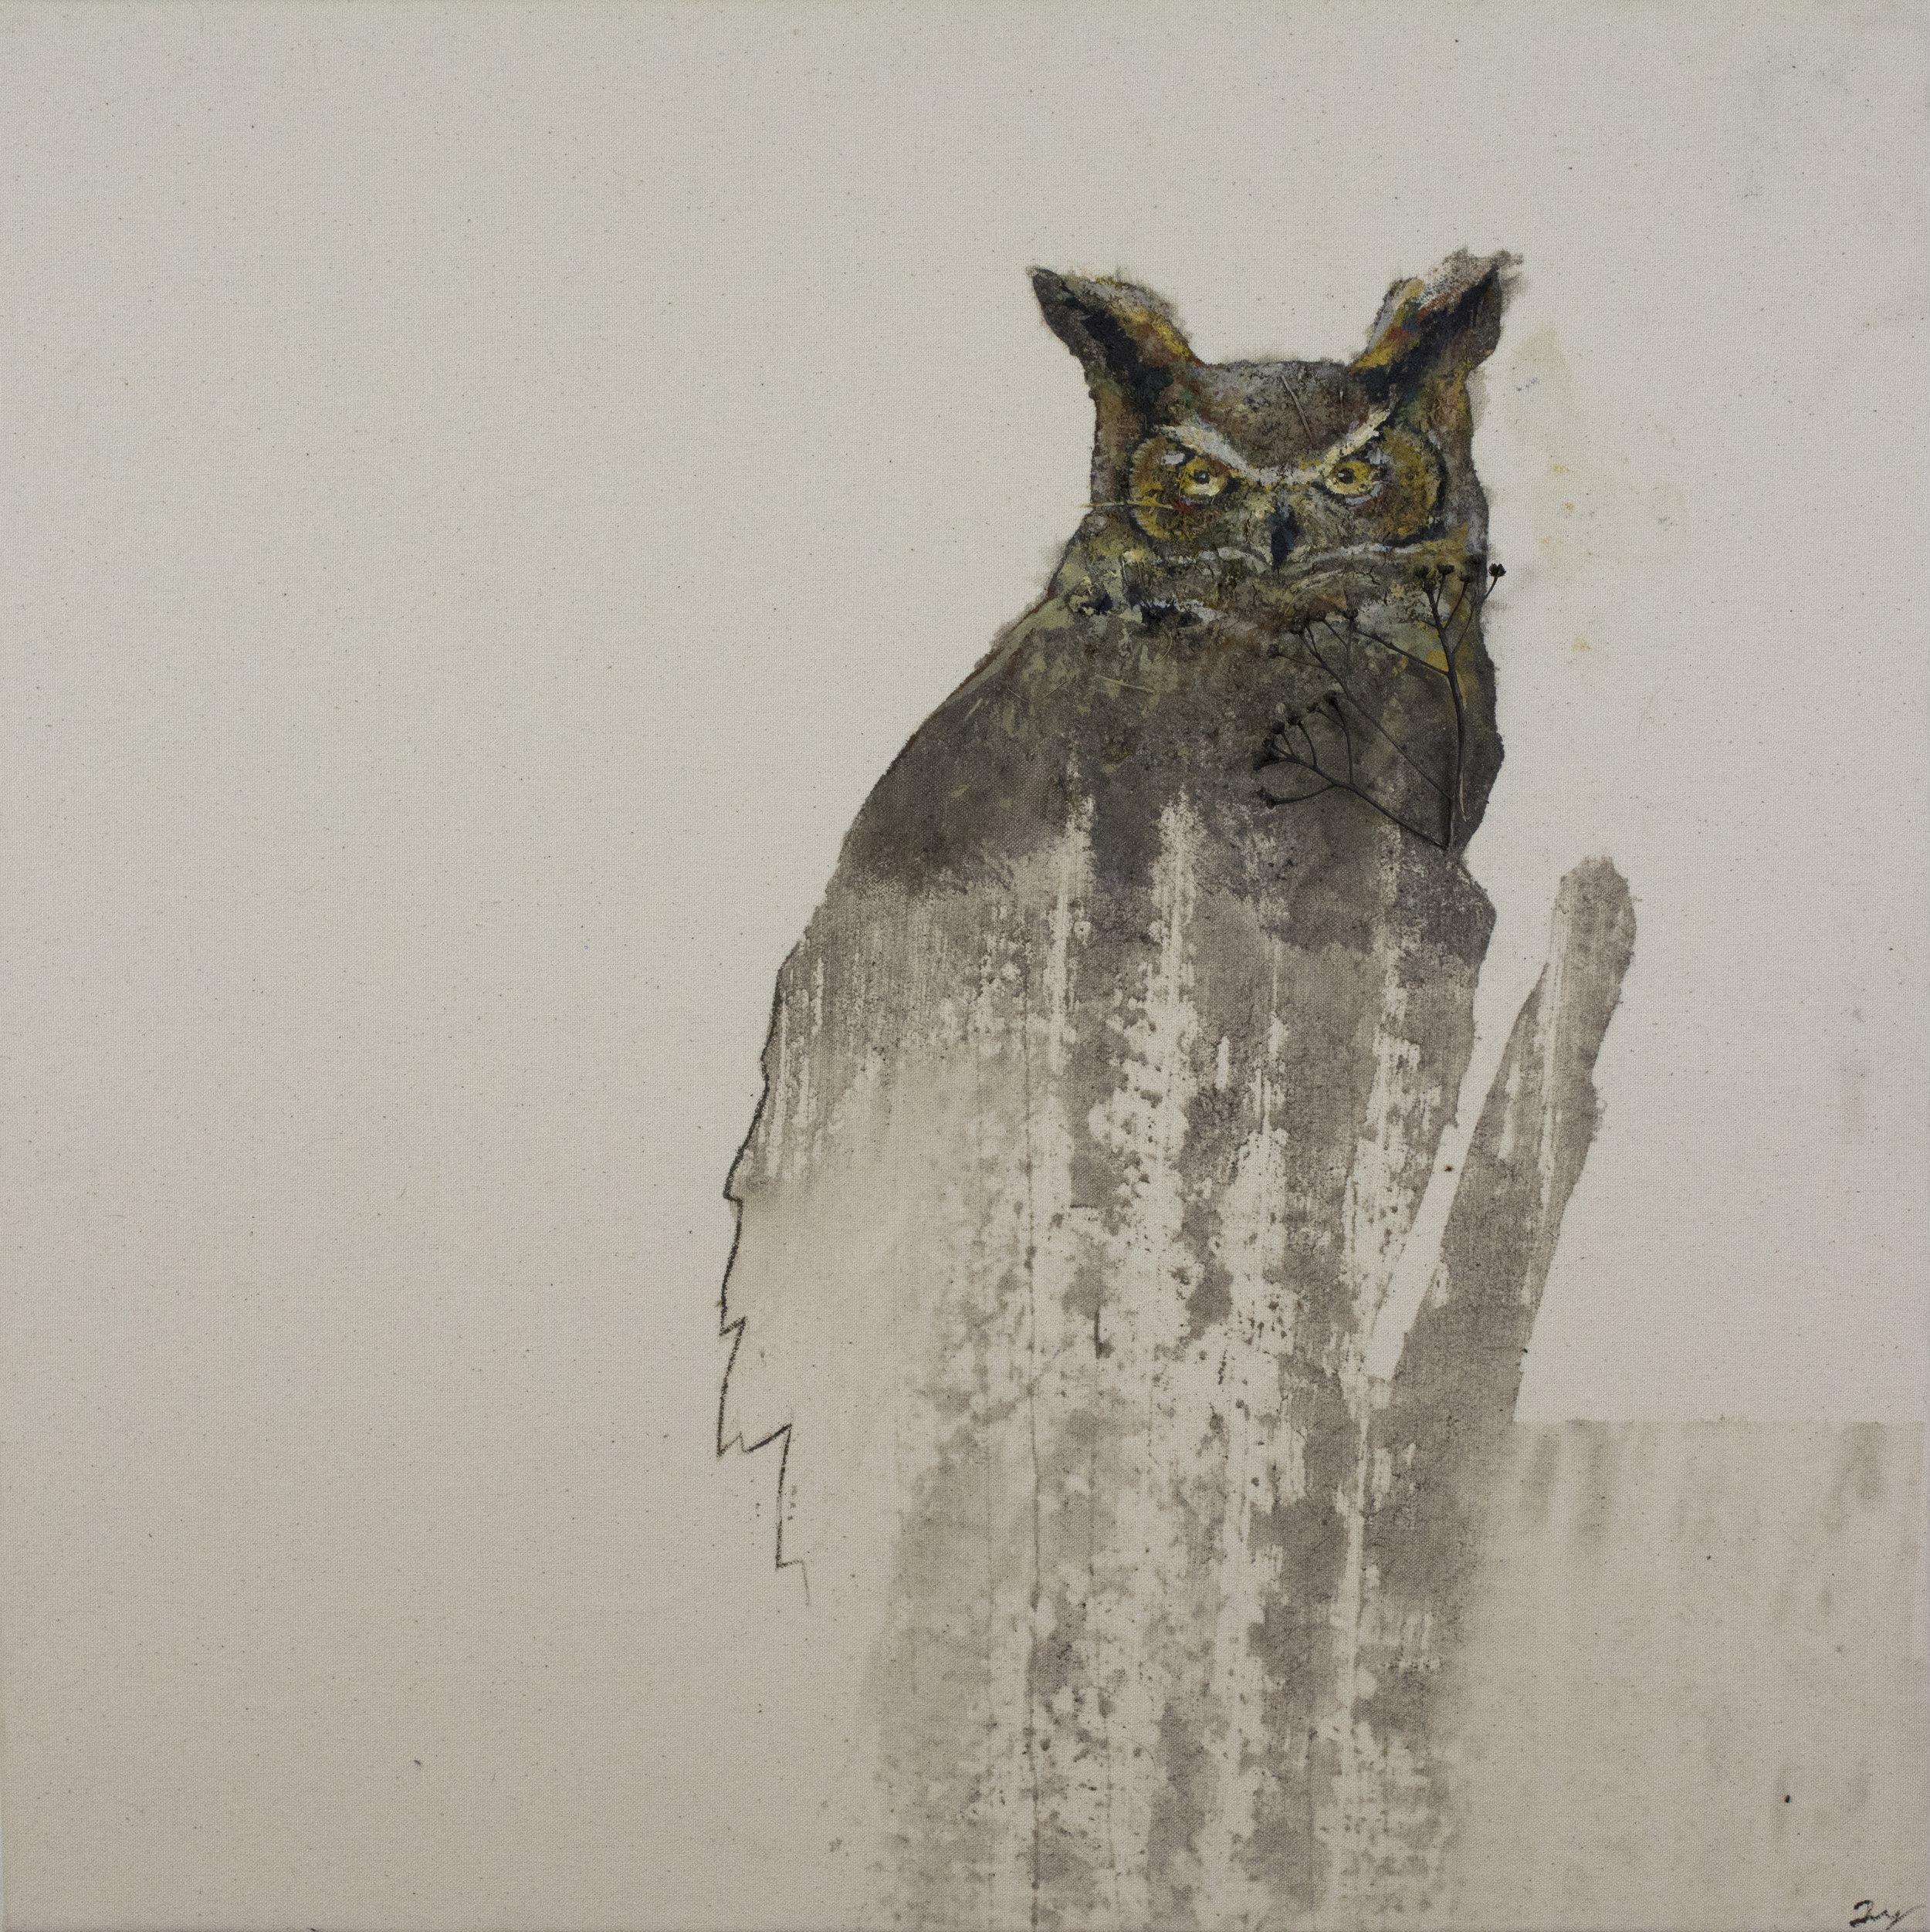 Earth Birds, Great Horned Owl